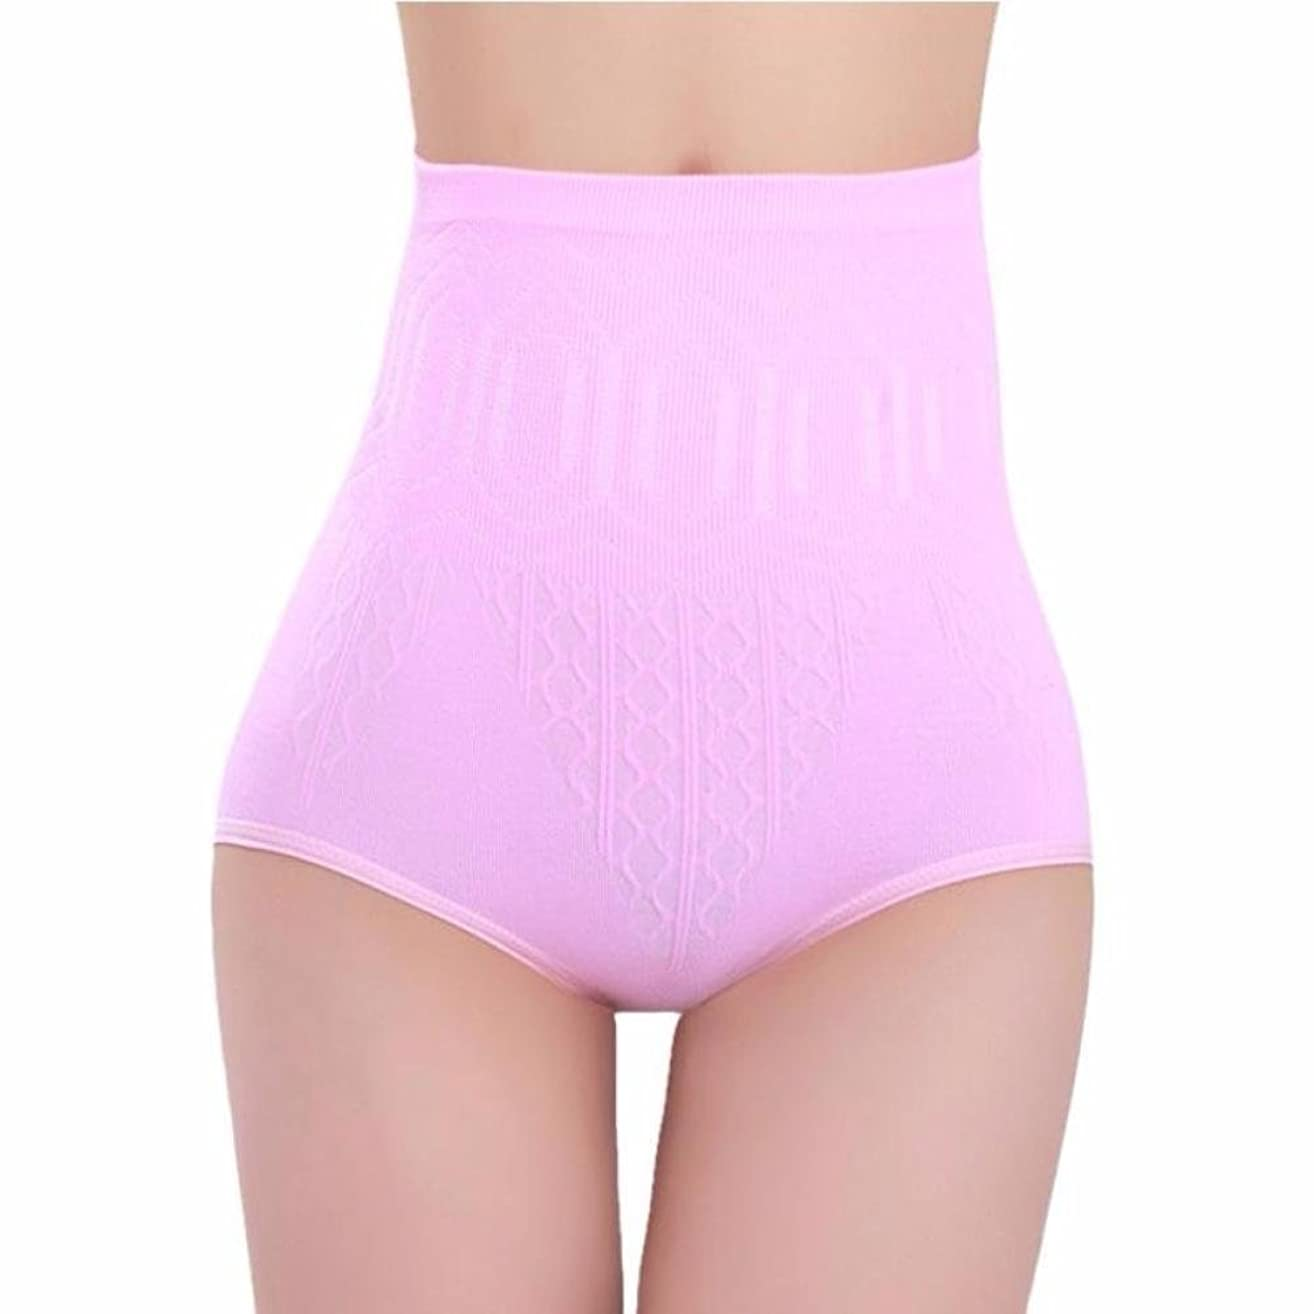 Conina Women's Underwear, Casual Sexy High Waist Tummy Control Body Shaper Briefs Slimming Pants